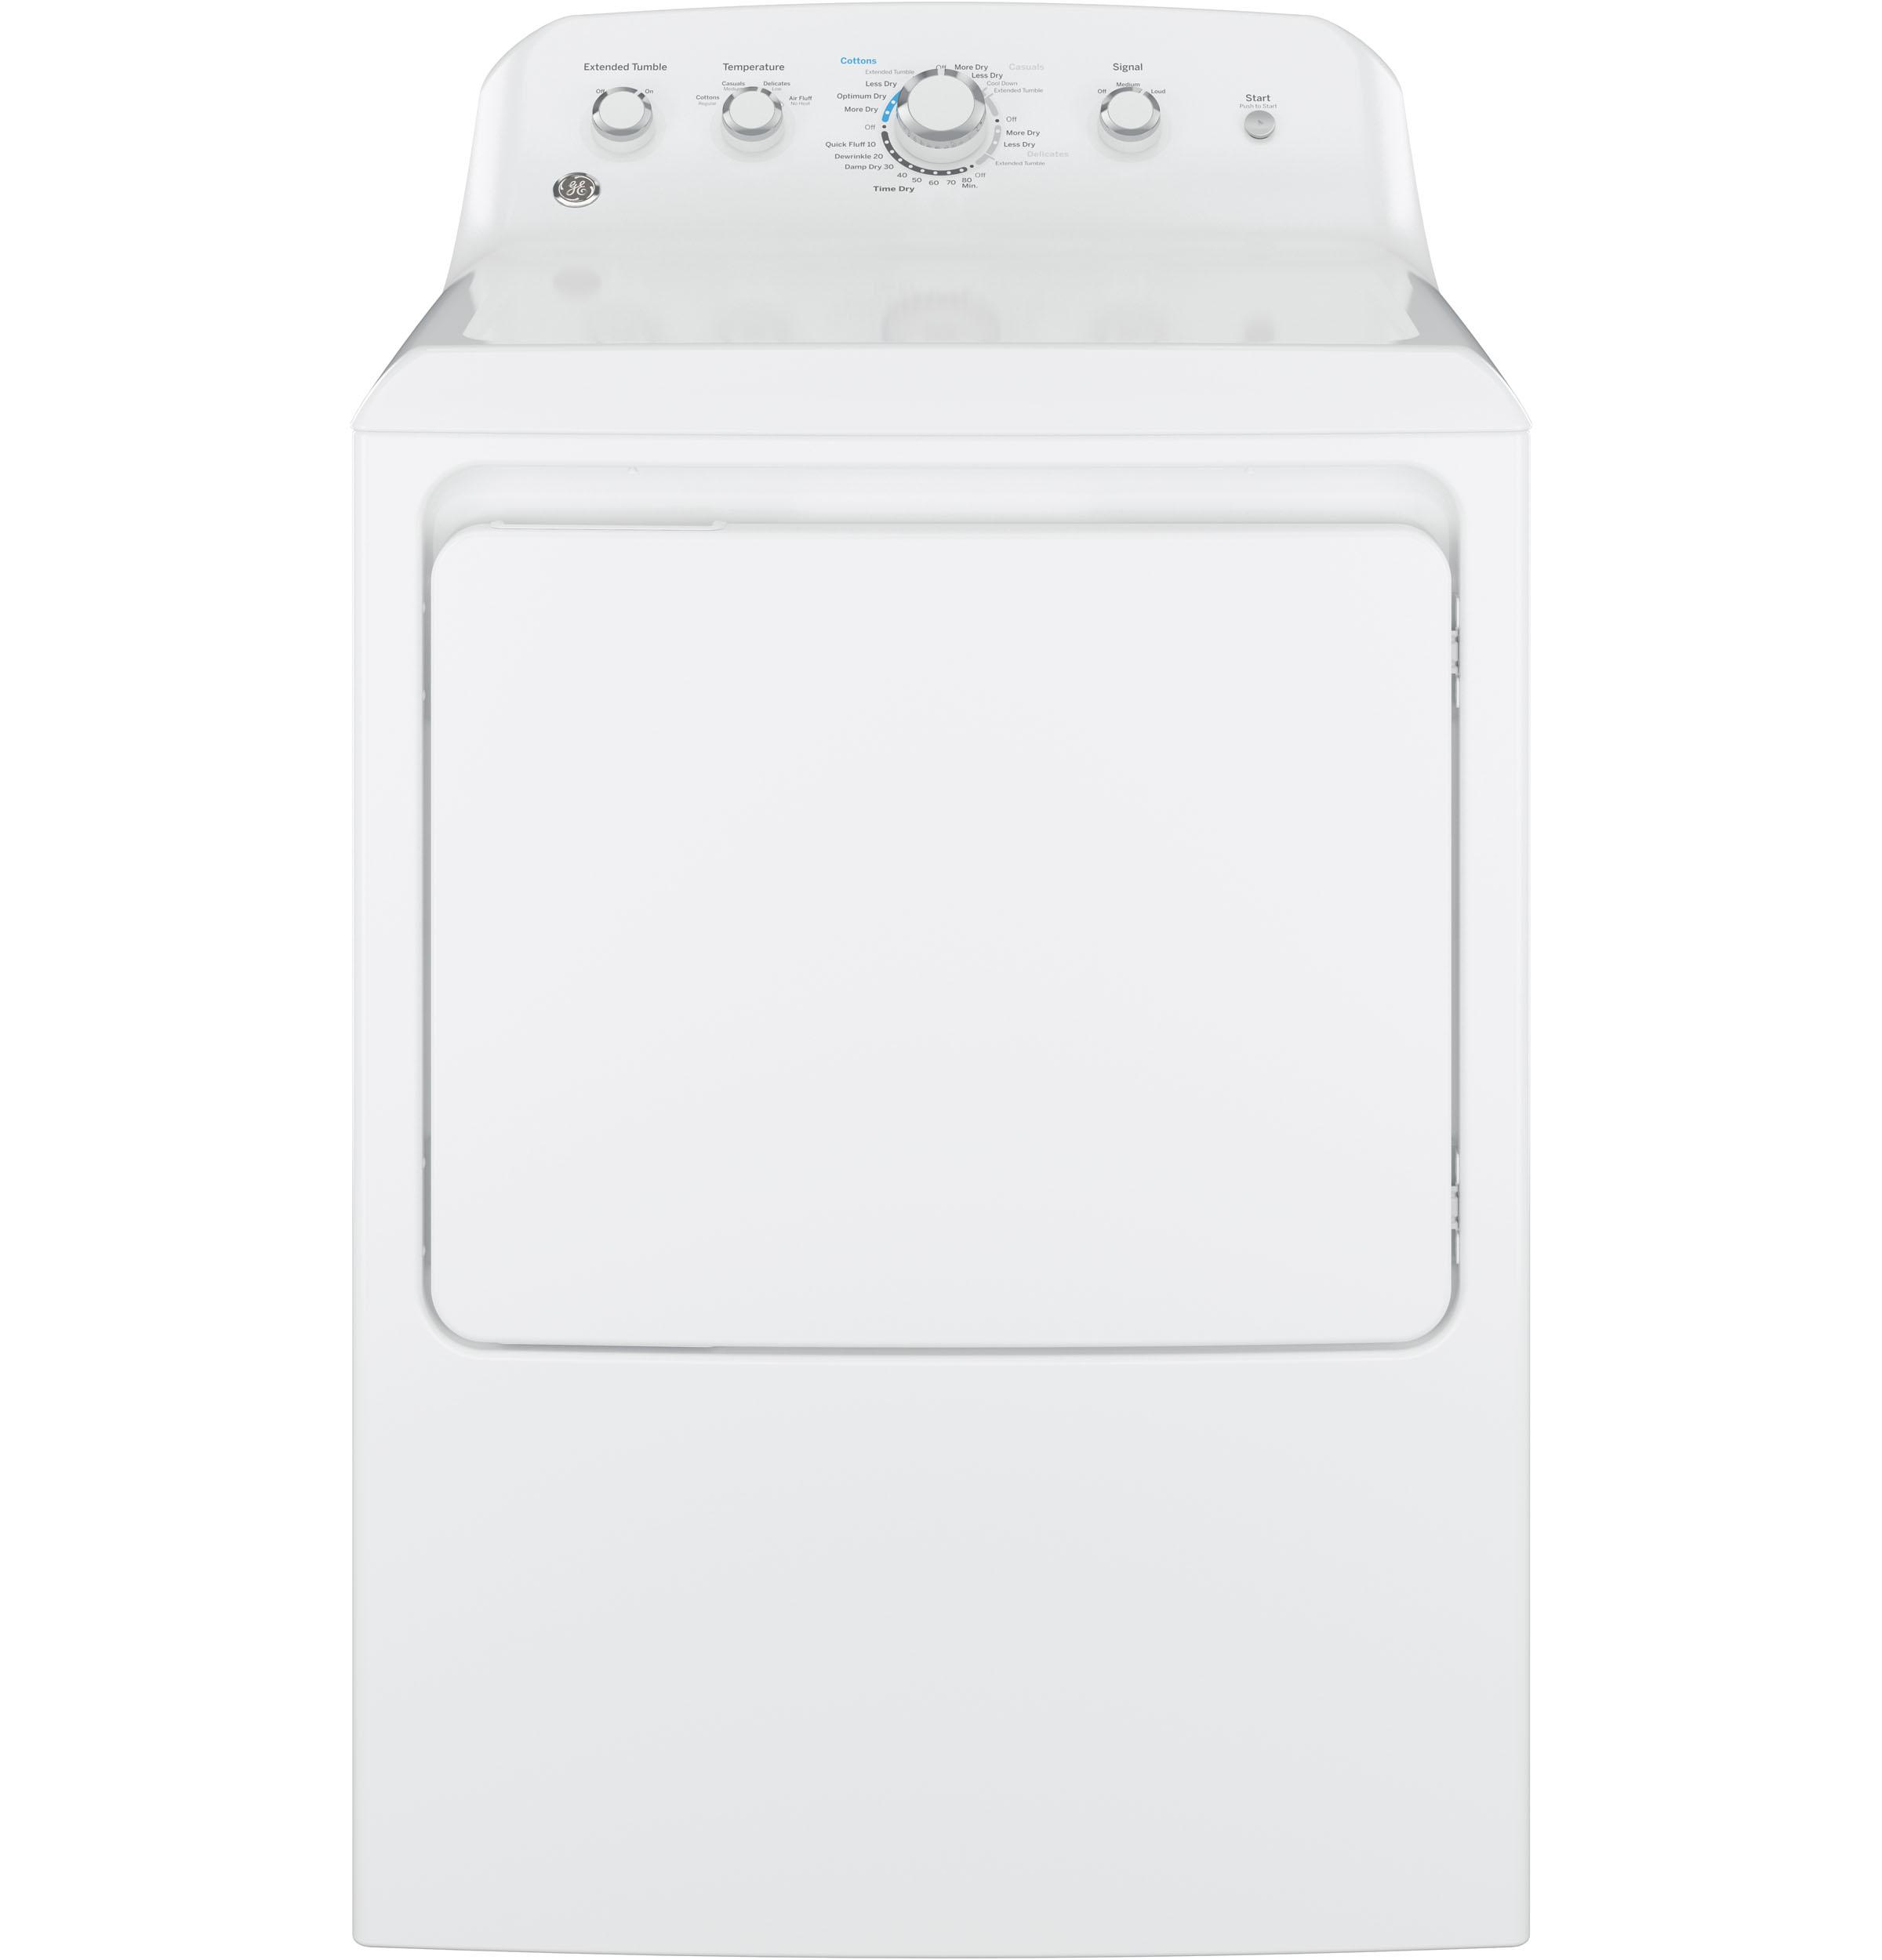 Shop Appliances In Springfield Il Dick Van Dyke Appliance World Dryer Belt Diagram Also Whirlpool Microwave Oven On Ge Electric White Gtd42easjww